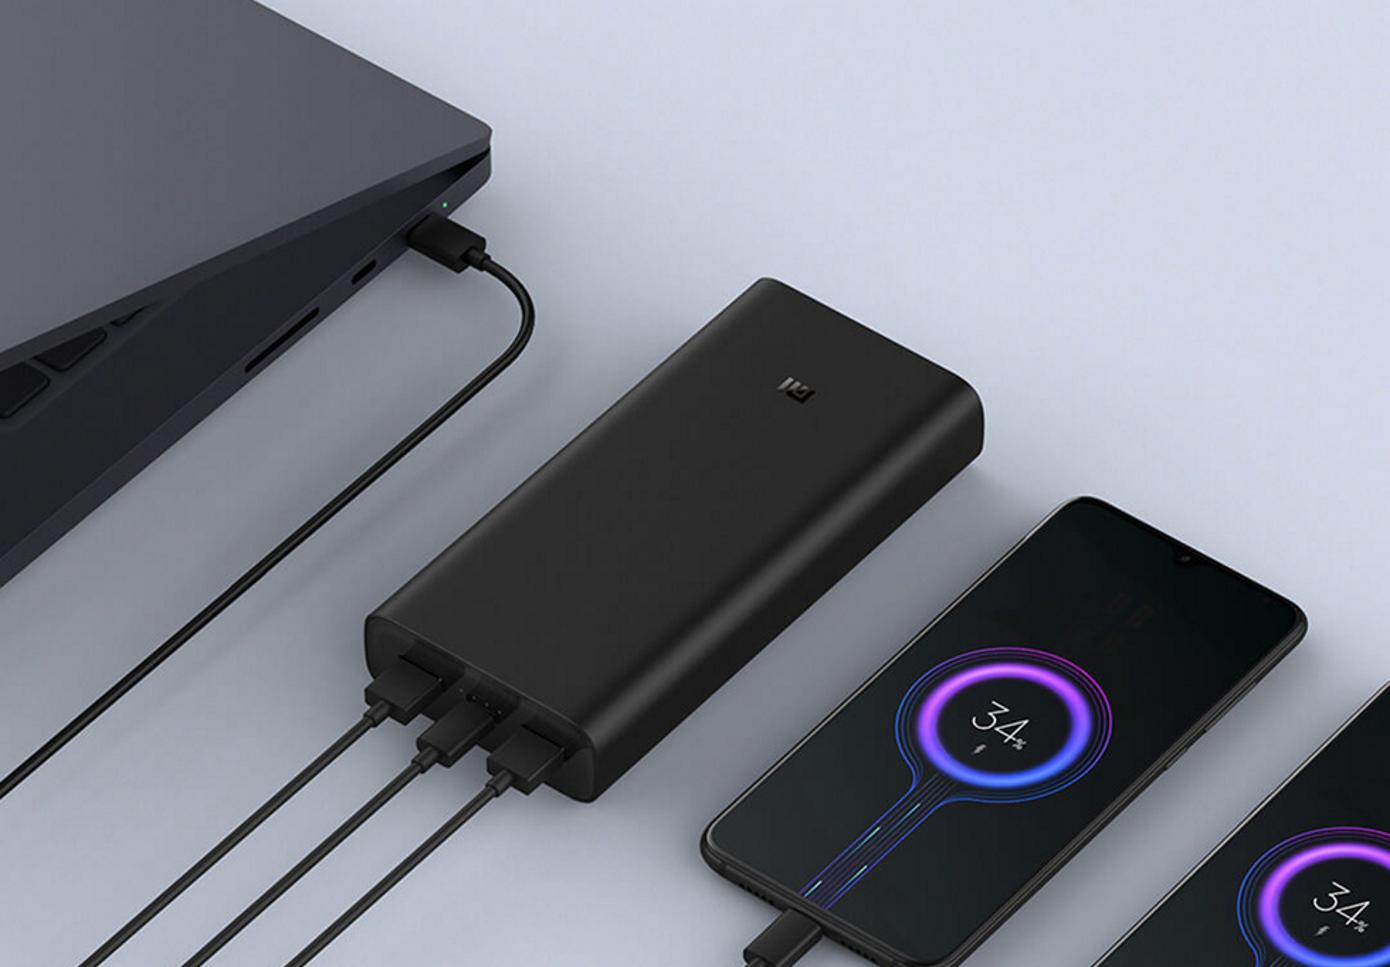 Opisanie Vneshnij Akkumulyator Xiaomi Power Bank 3 Super Flash Charge 20000 Mah Black Pb2050zm 7